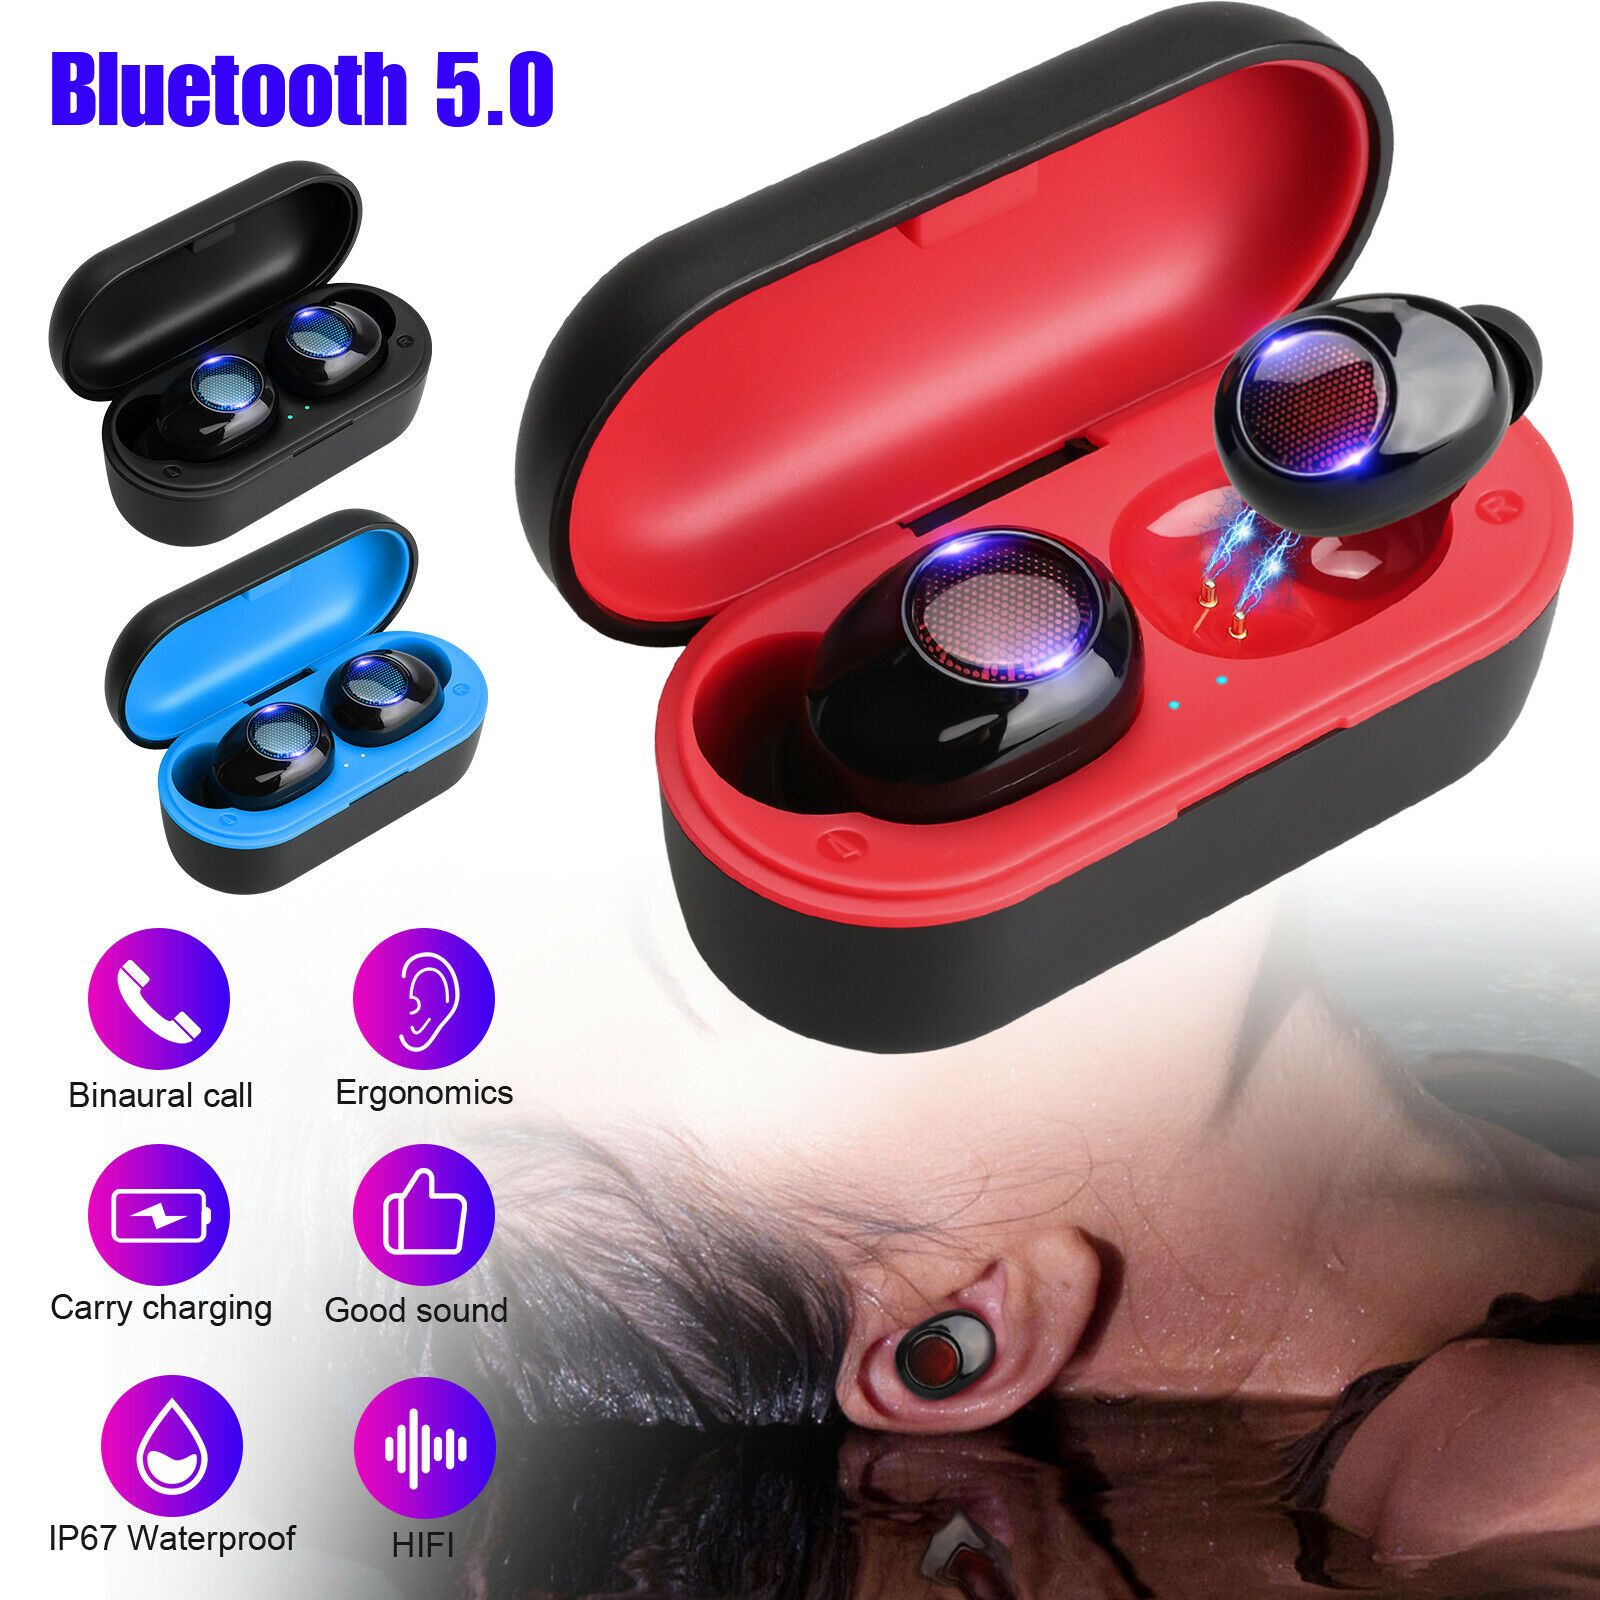 Pin By Hi I M Yukari On Earpods Earphone In 2020 Bluetooth Earbuds Bluetooth Earbuds Wireless Earbuds